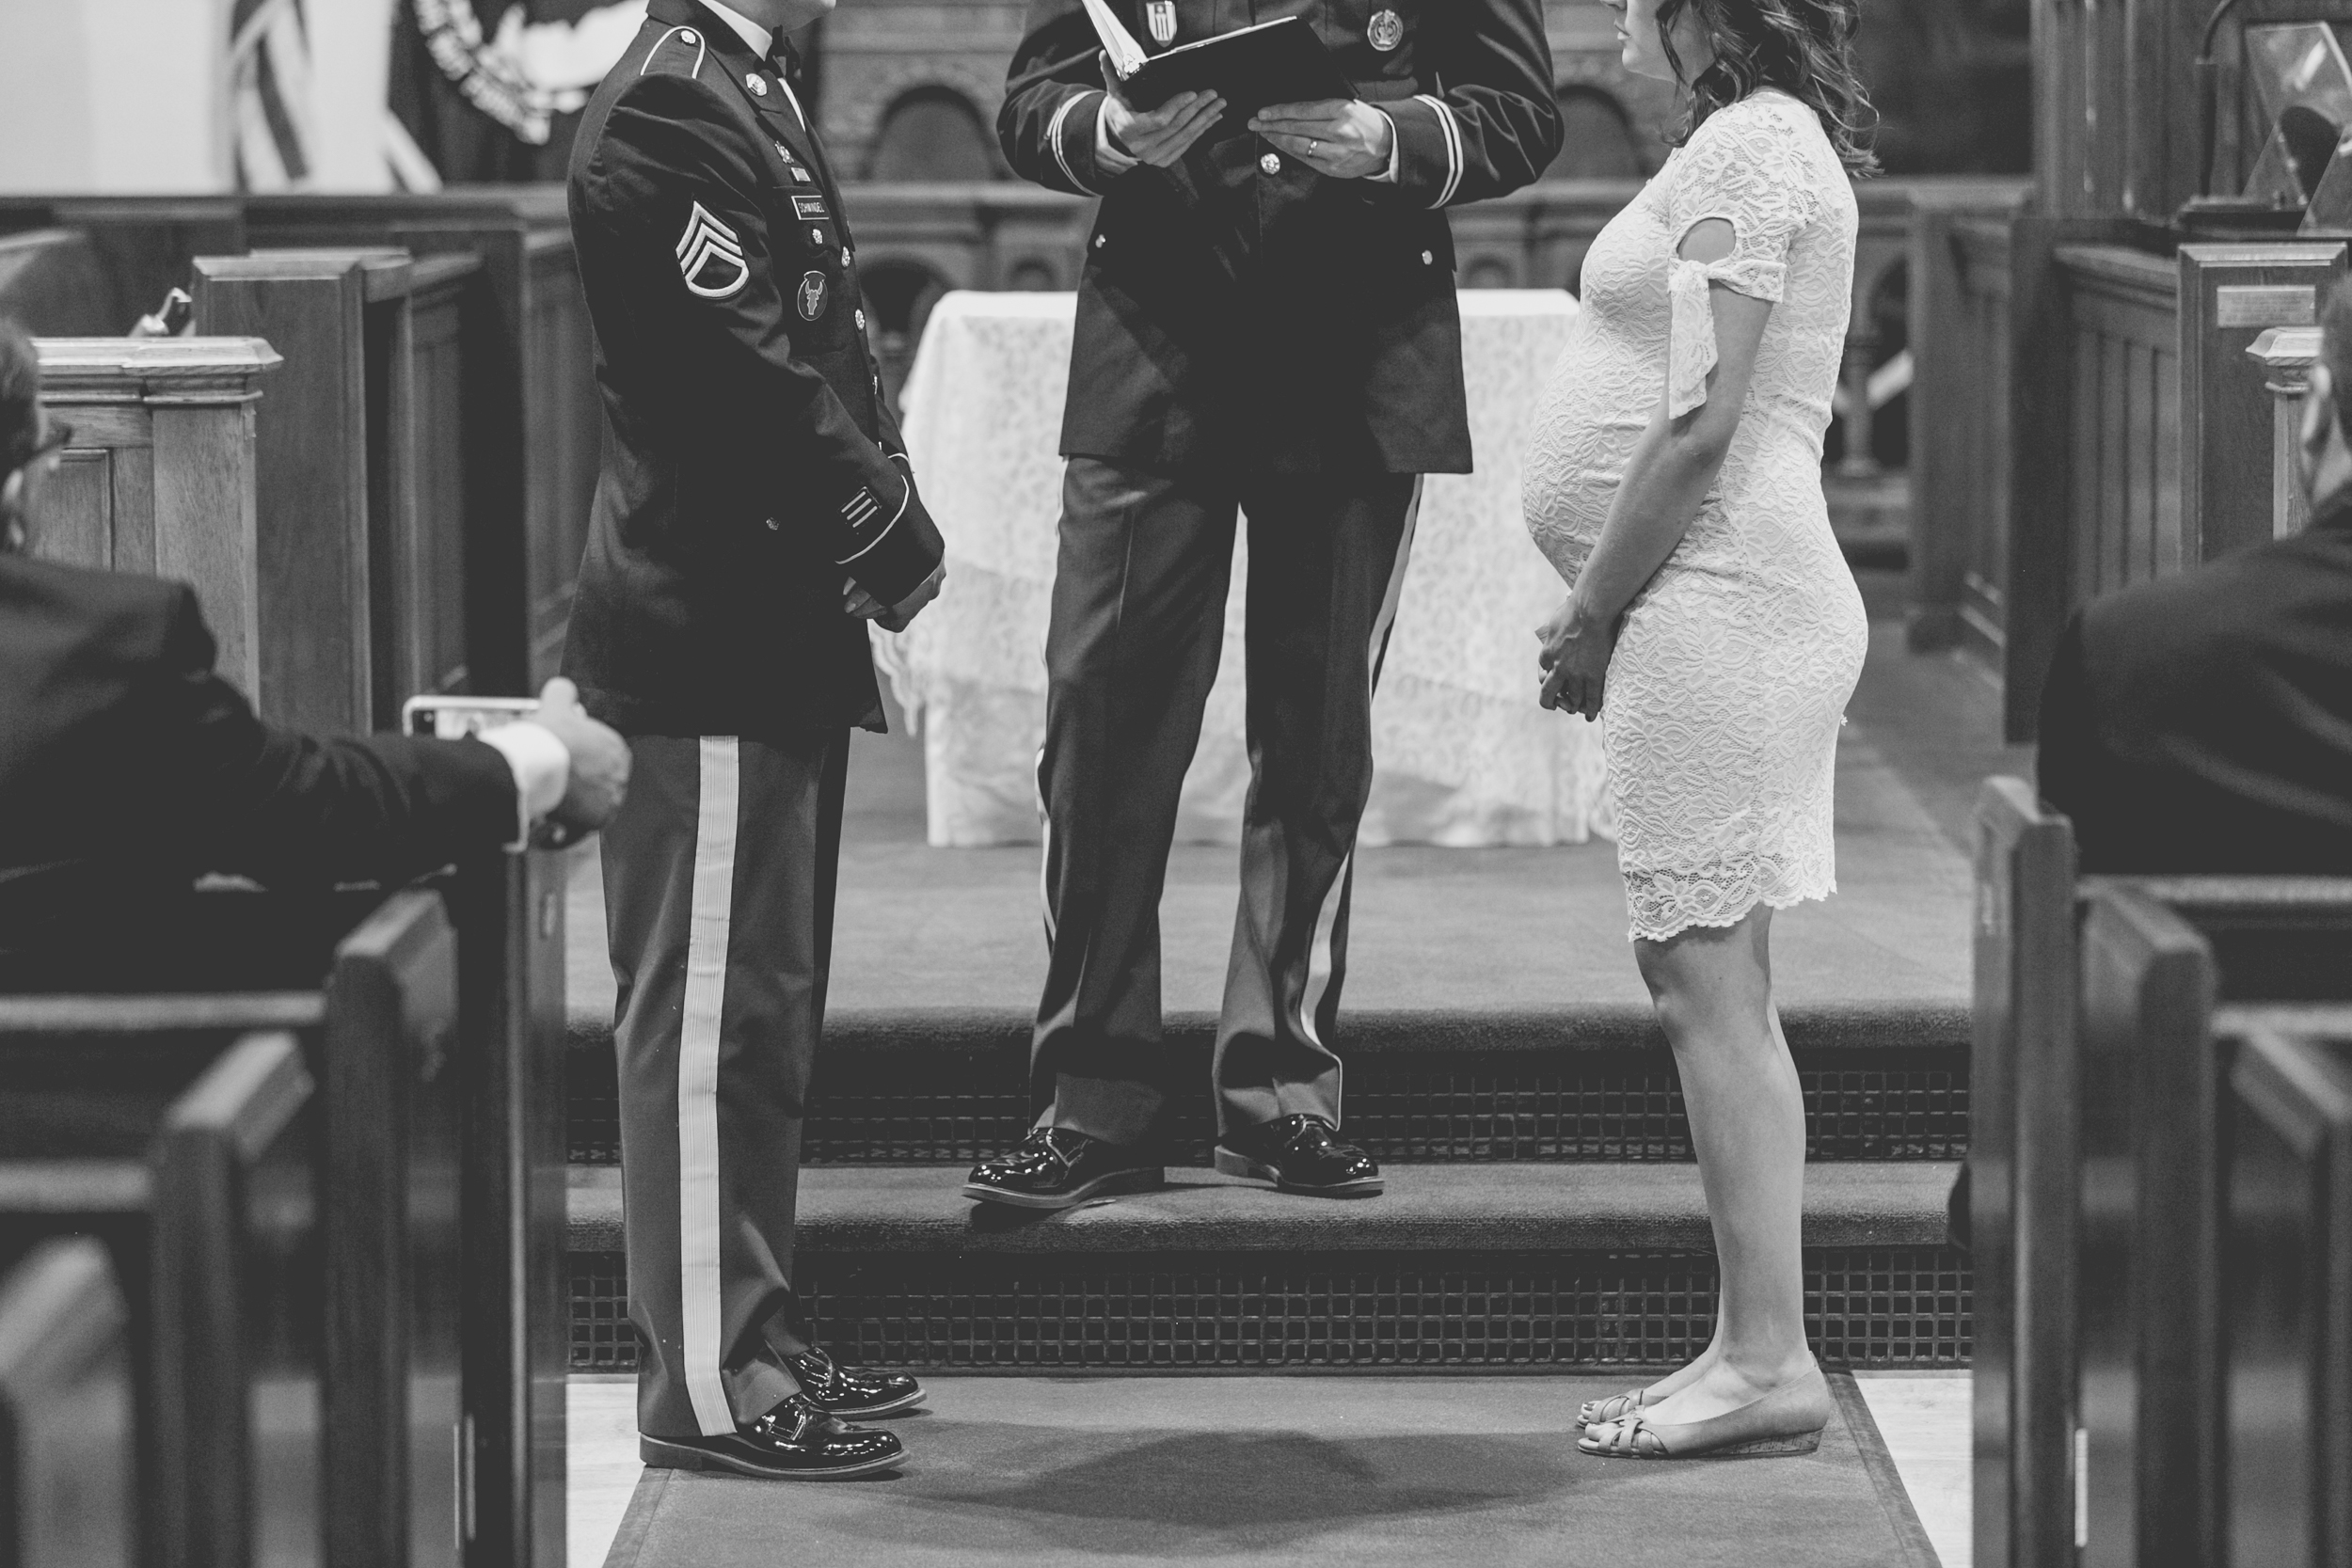 Fort Snelling Elopement St. Paul, MN, Fort Snelling Elopement, Military Elopement, Intimate Military Wedding, intimate elopement wedding-www.rachelsmak.com29.jpg